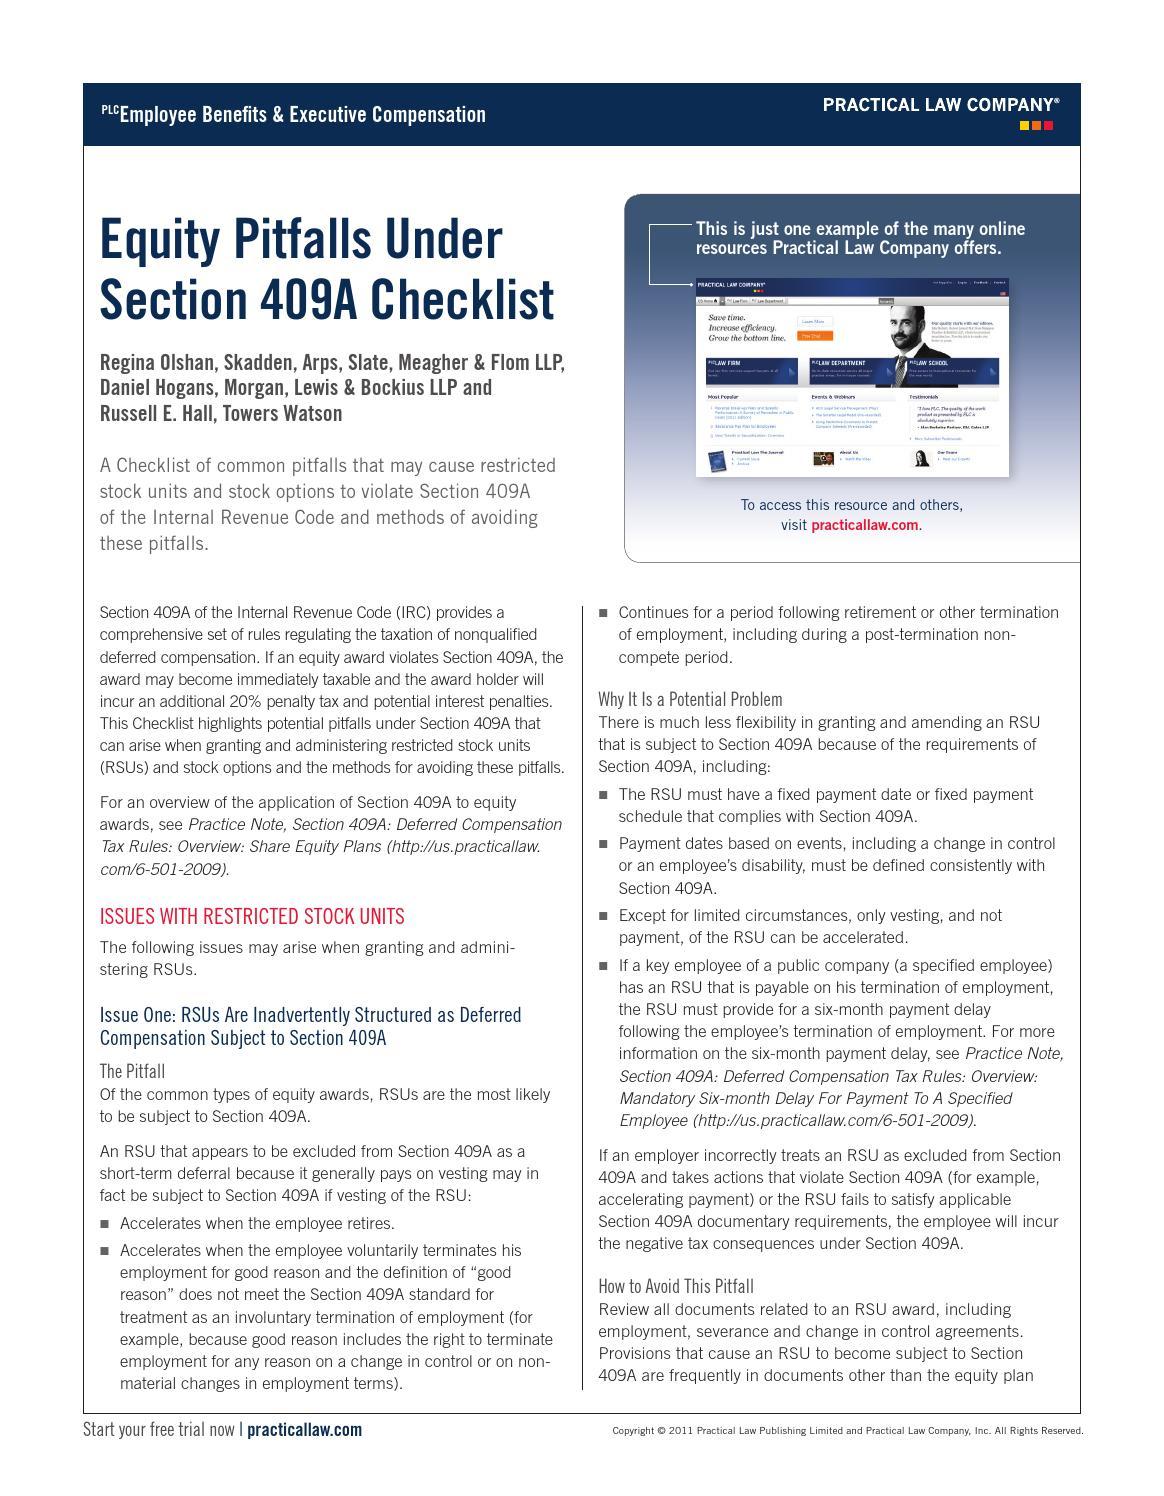 Equity Pitfalls Under Section 409a Checklist   Skadden Law et al  by